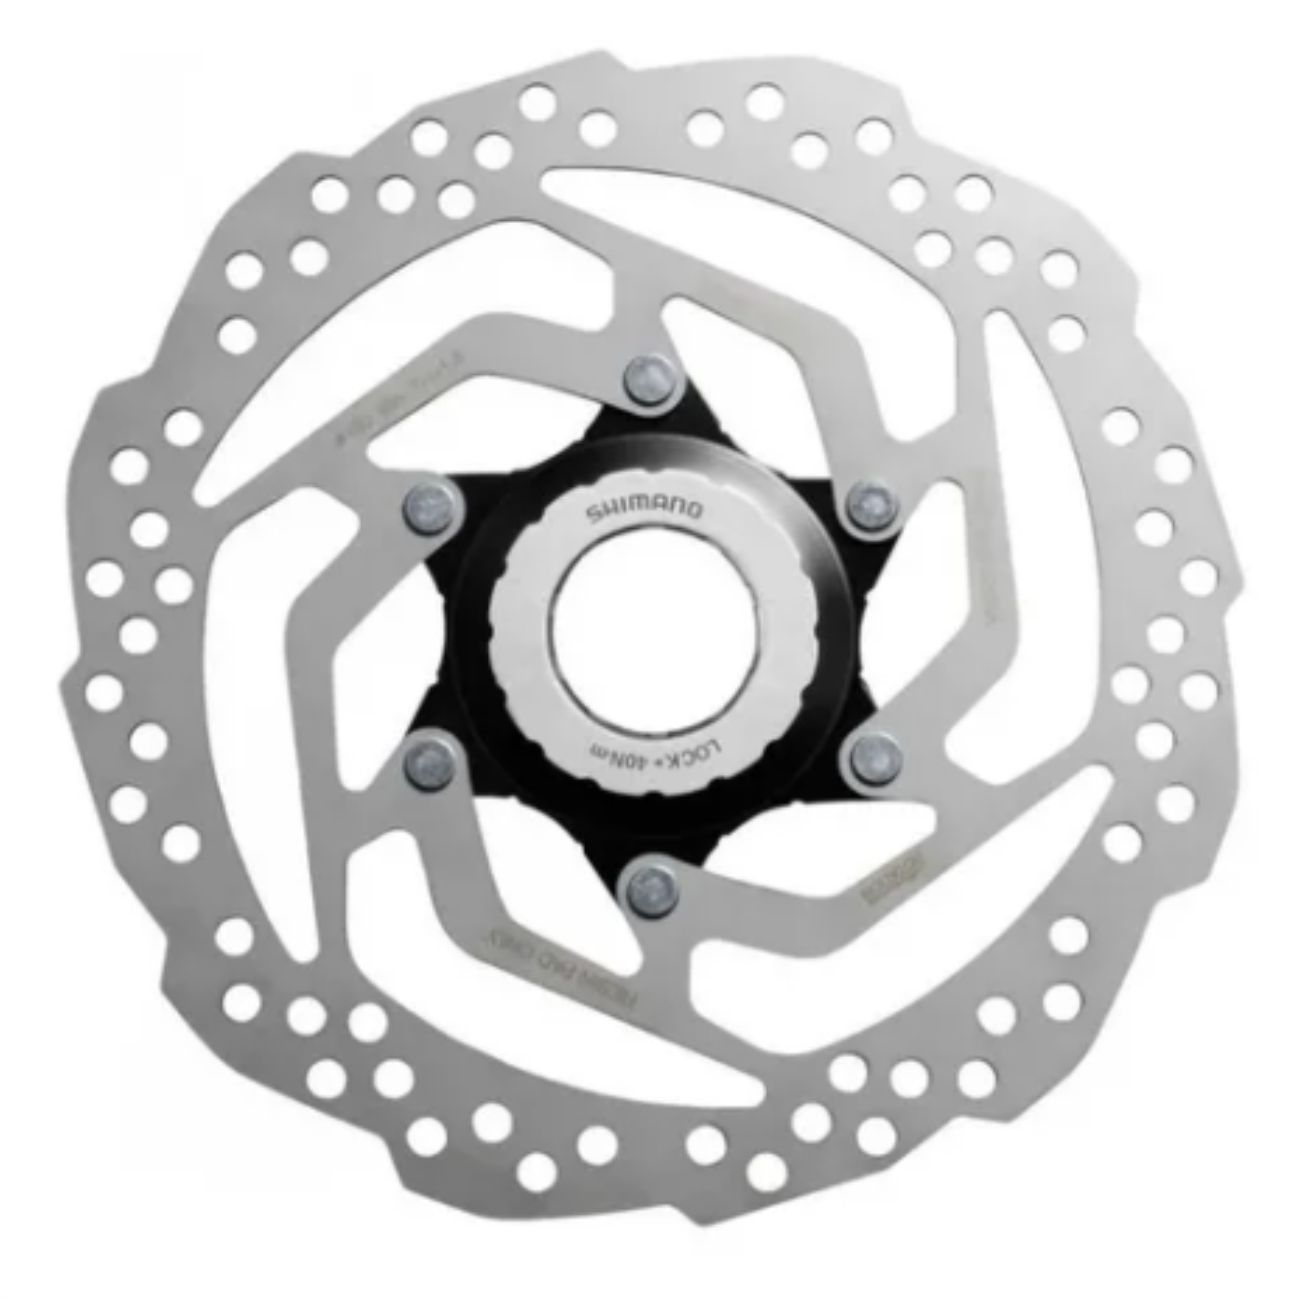 Disco De Freio Shimano Sm- Rt10 Center Lock 160mm